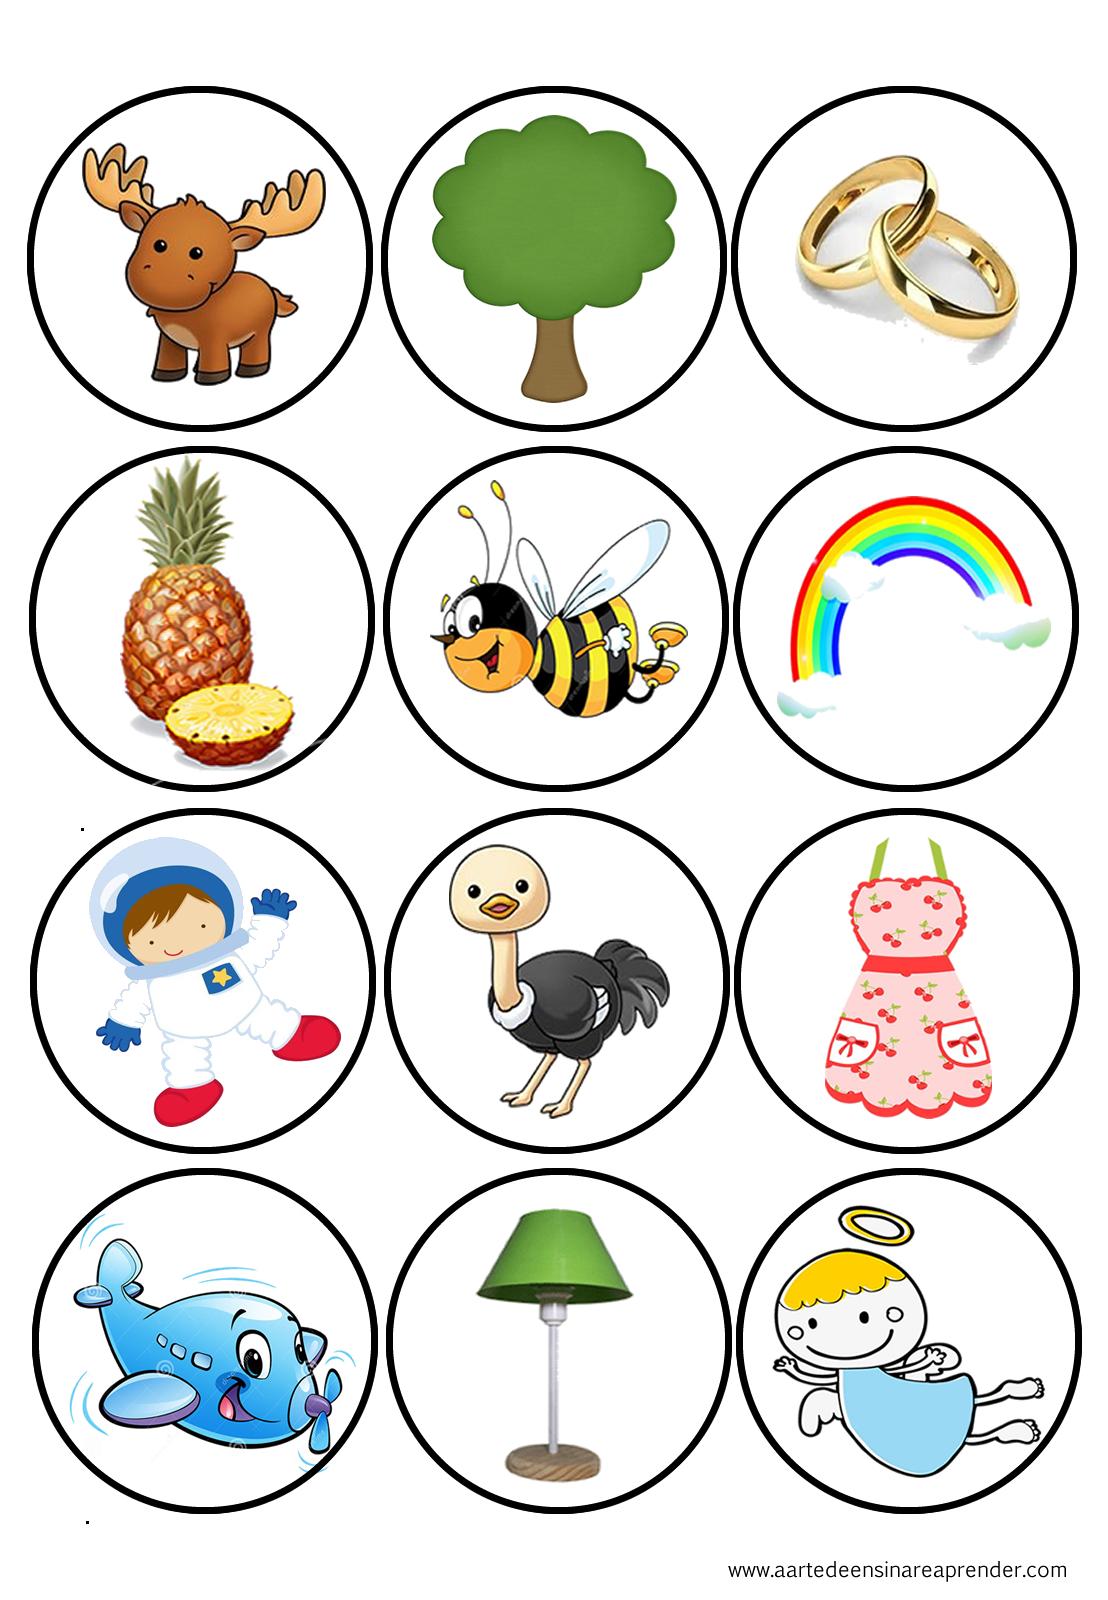 Jogo Vogaisa Png 1 108 1 600 Pixels Infantil Educacao Infantil